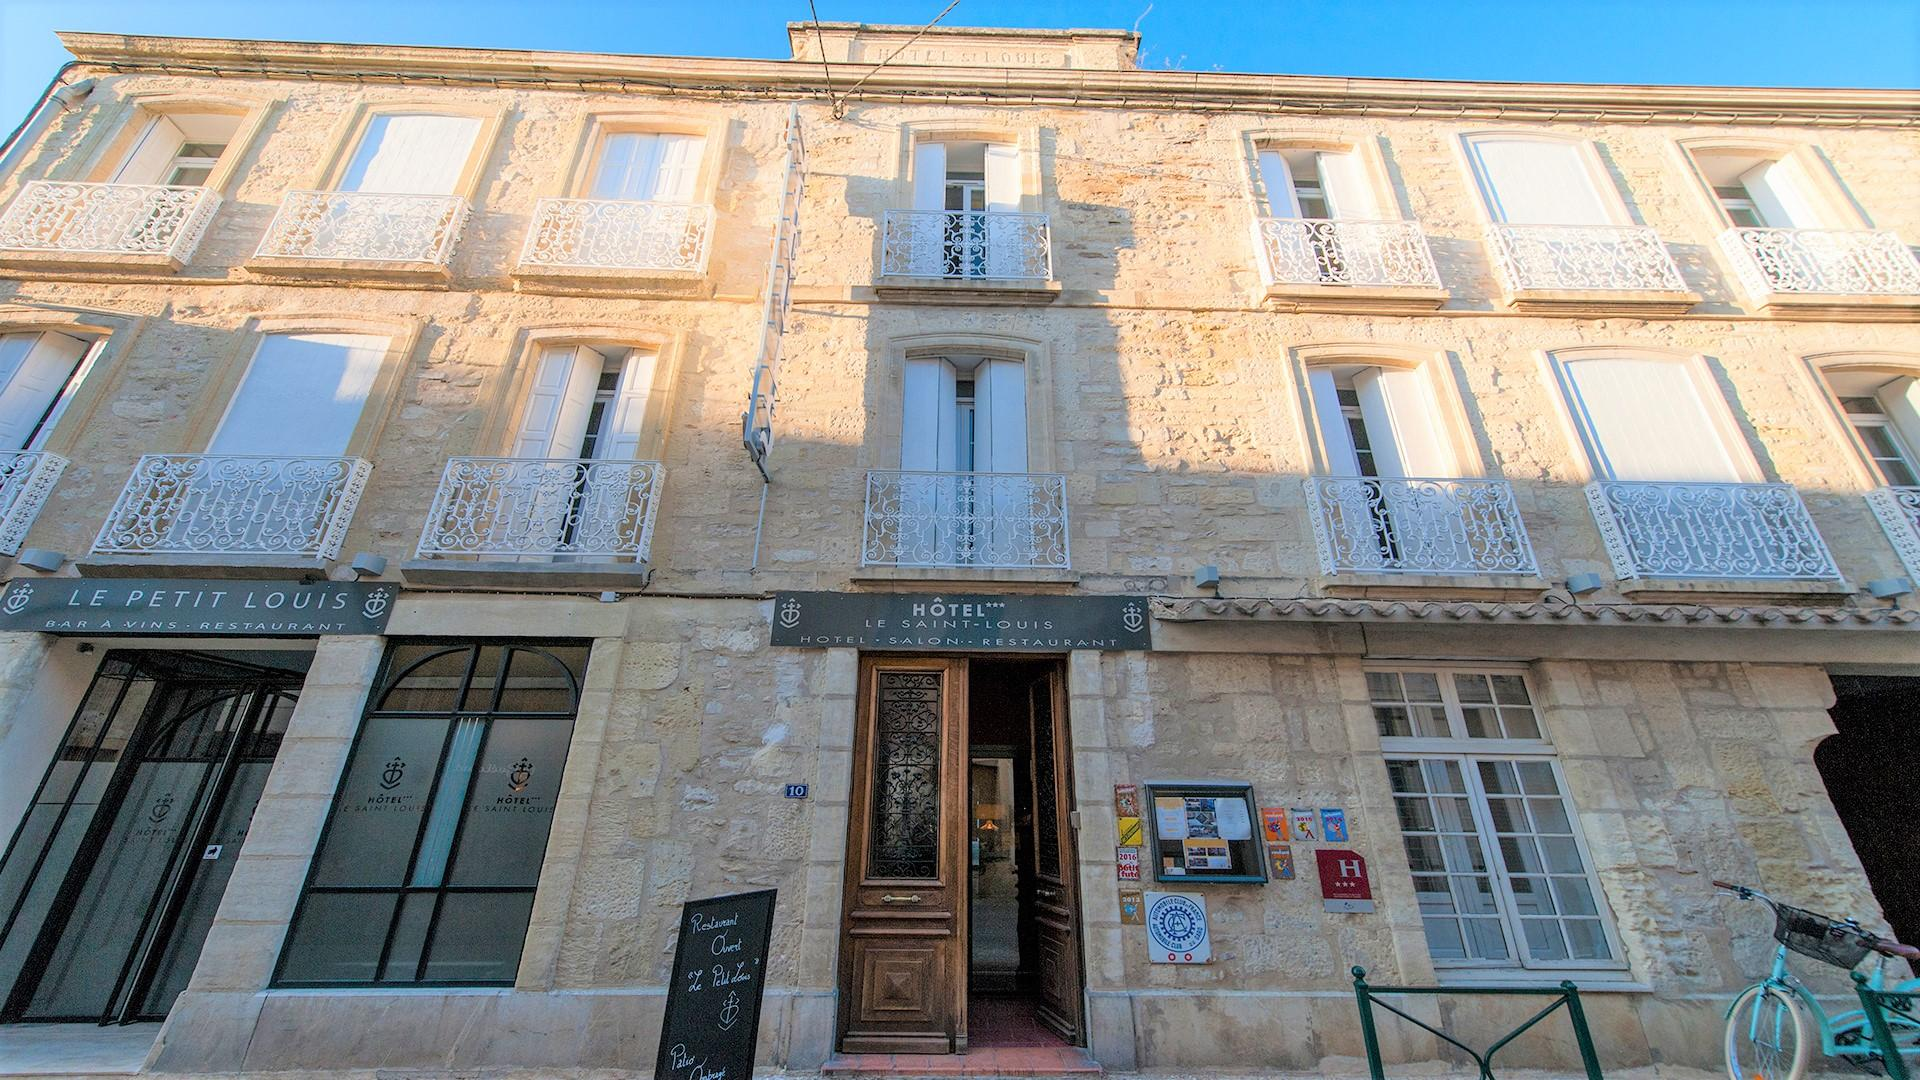 le-saint-louis-aigues-mortes-incentive-gard-occitanie-camargue-facade